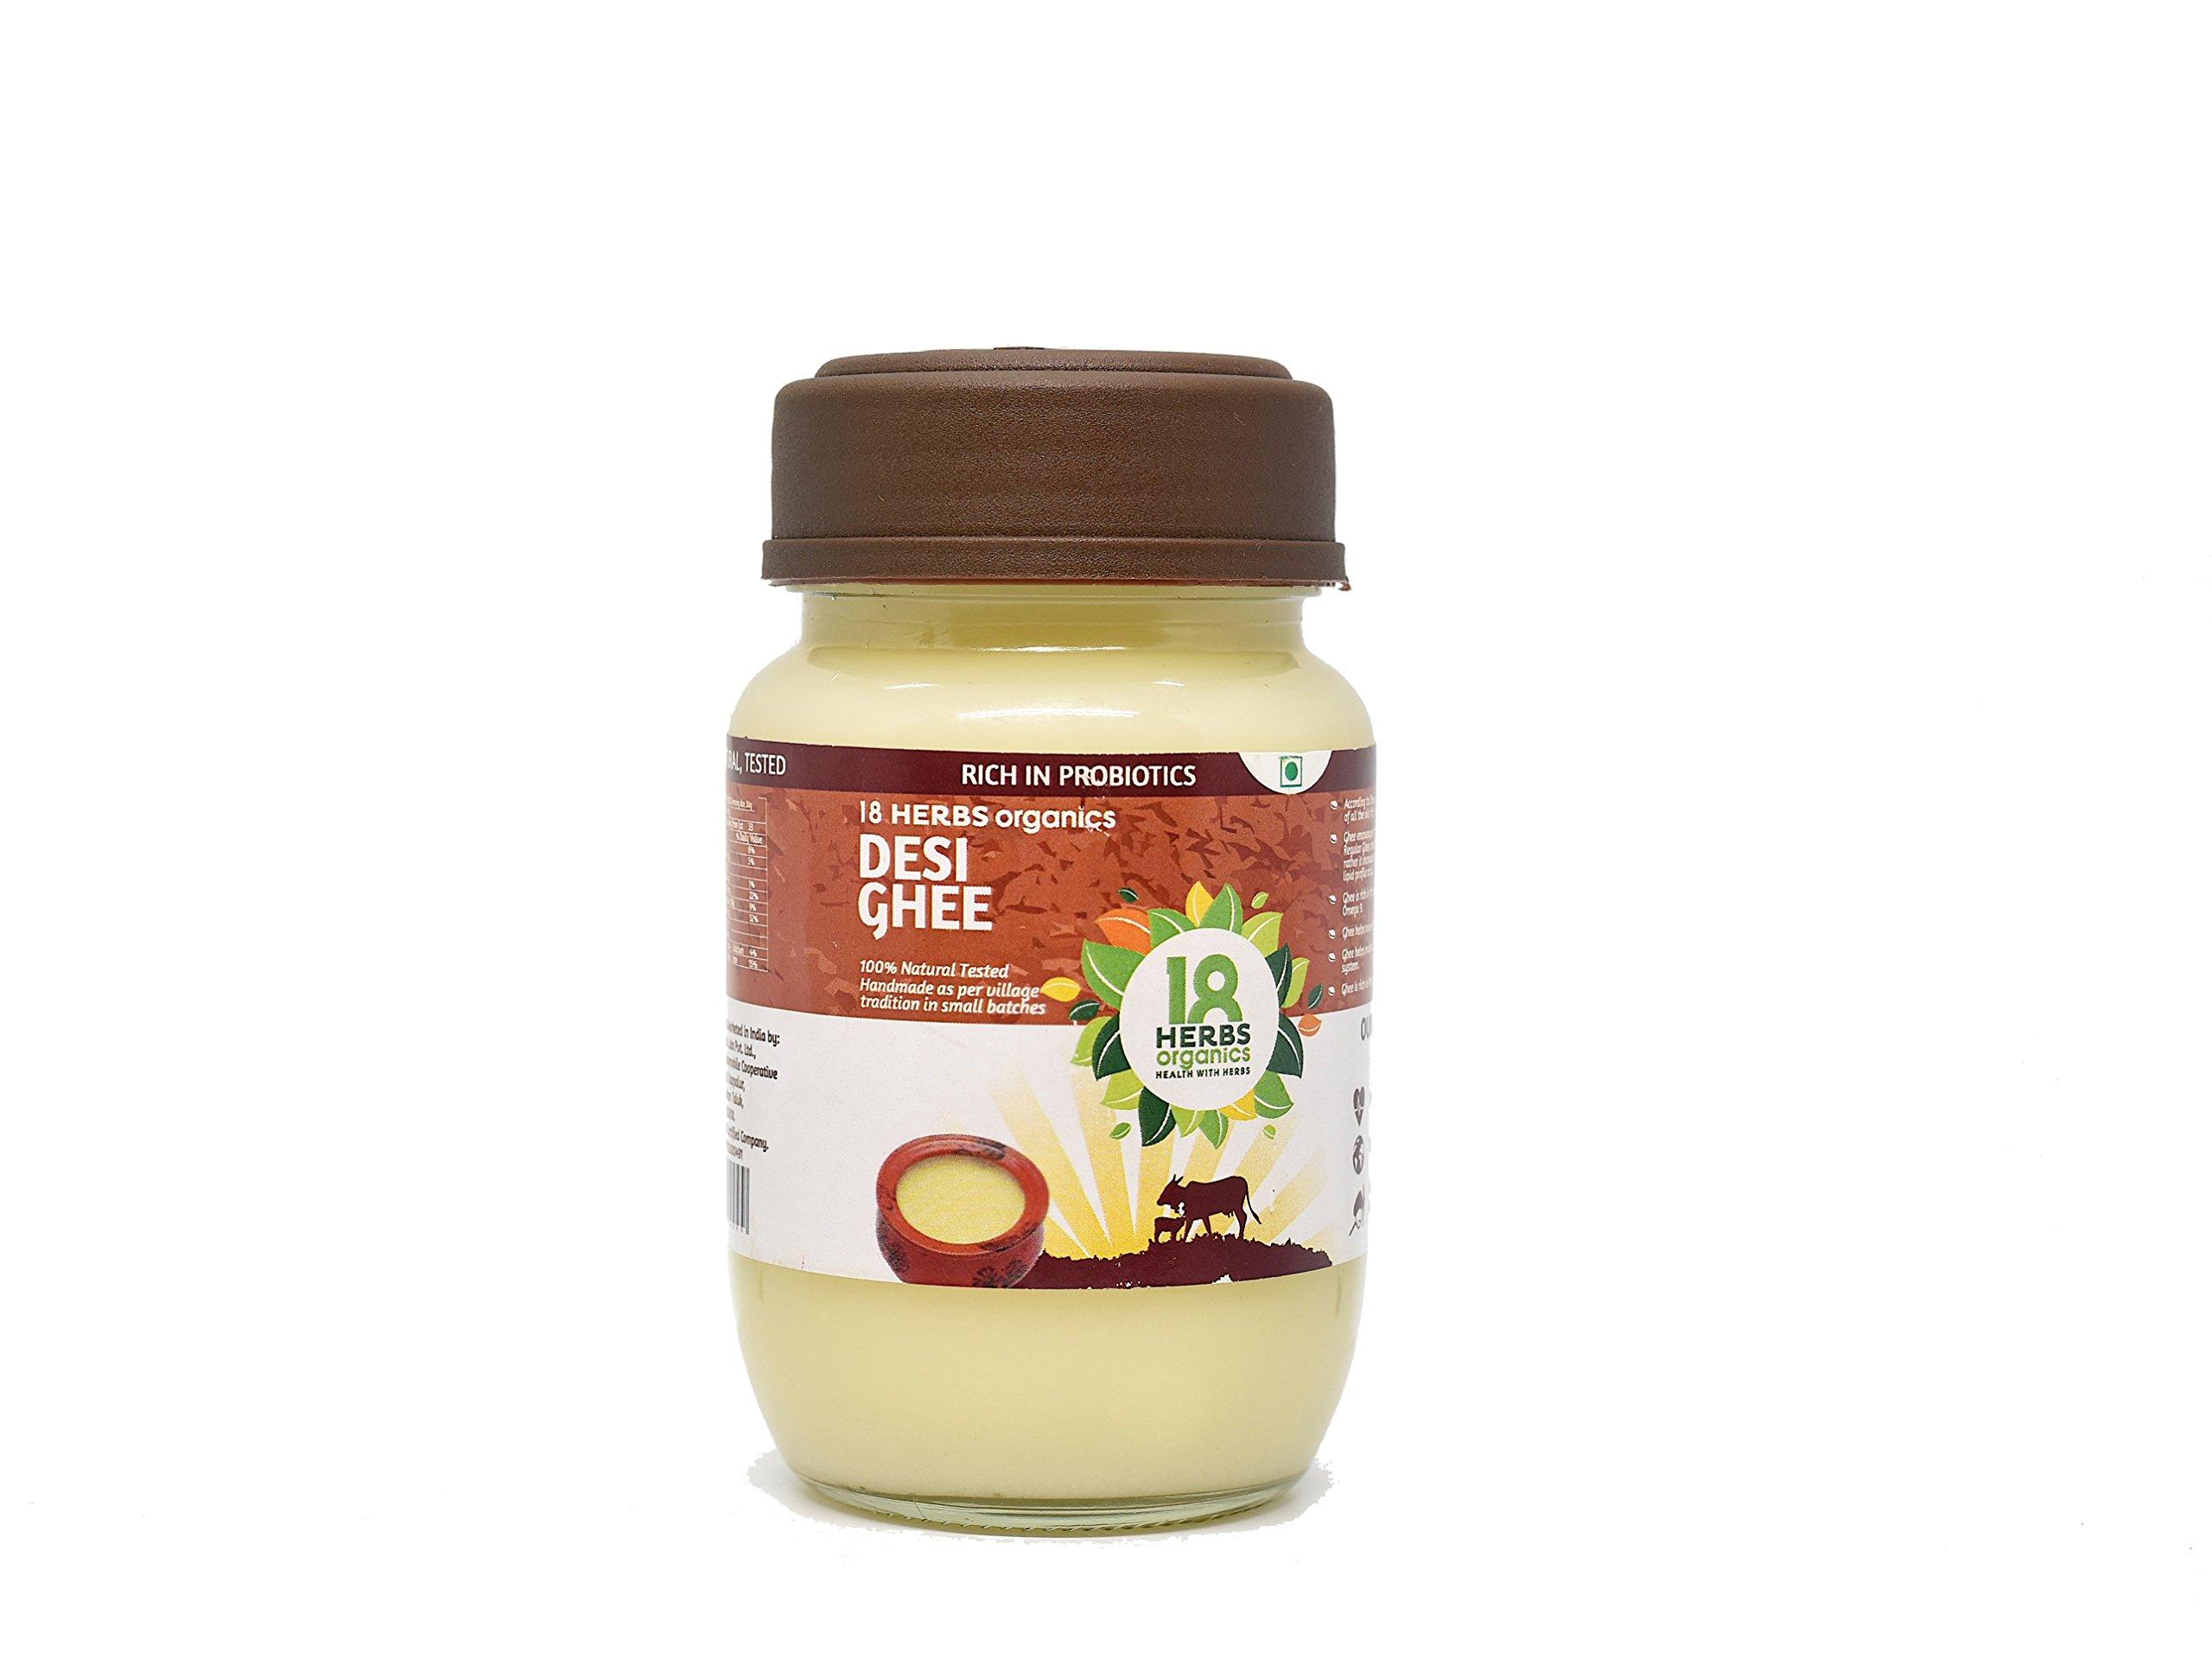 18 Herbs Organics - A2 Desi Cow Ghee - Probiotic Rich - Traditionally Made - Handmade Cow Ghee - 200 ml (B07FM2RGYT) Amazon Price History, Amazon Price Tracker